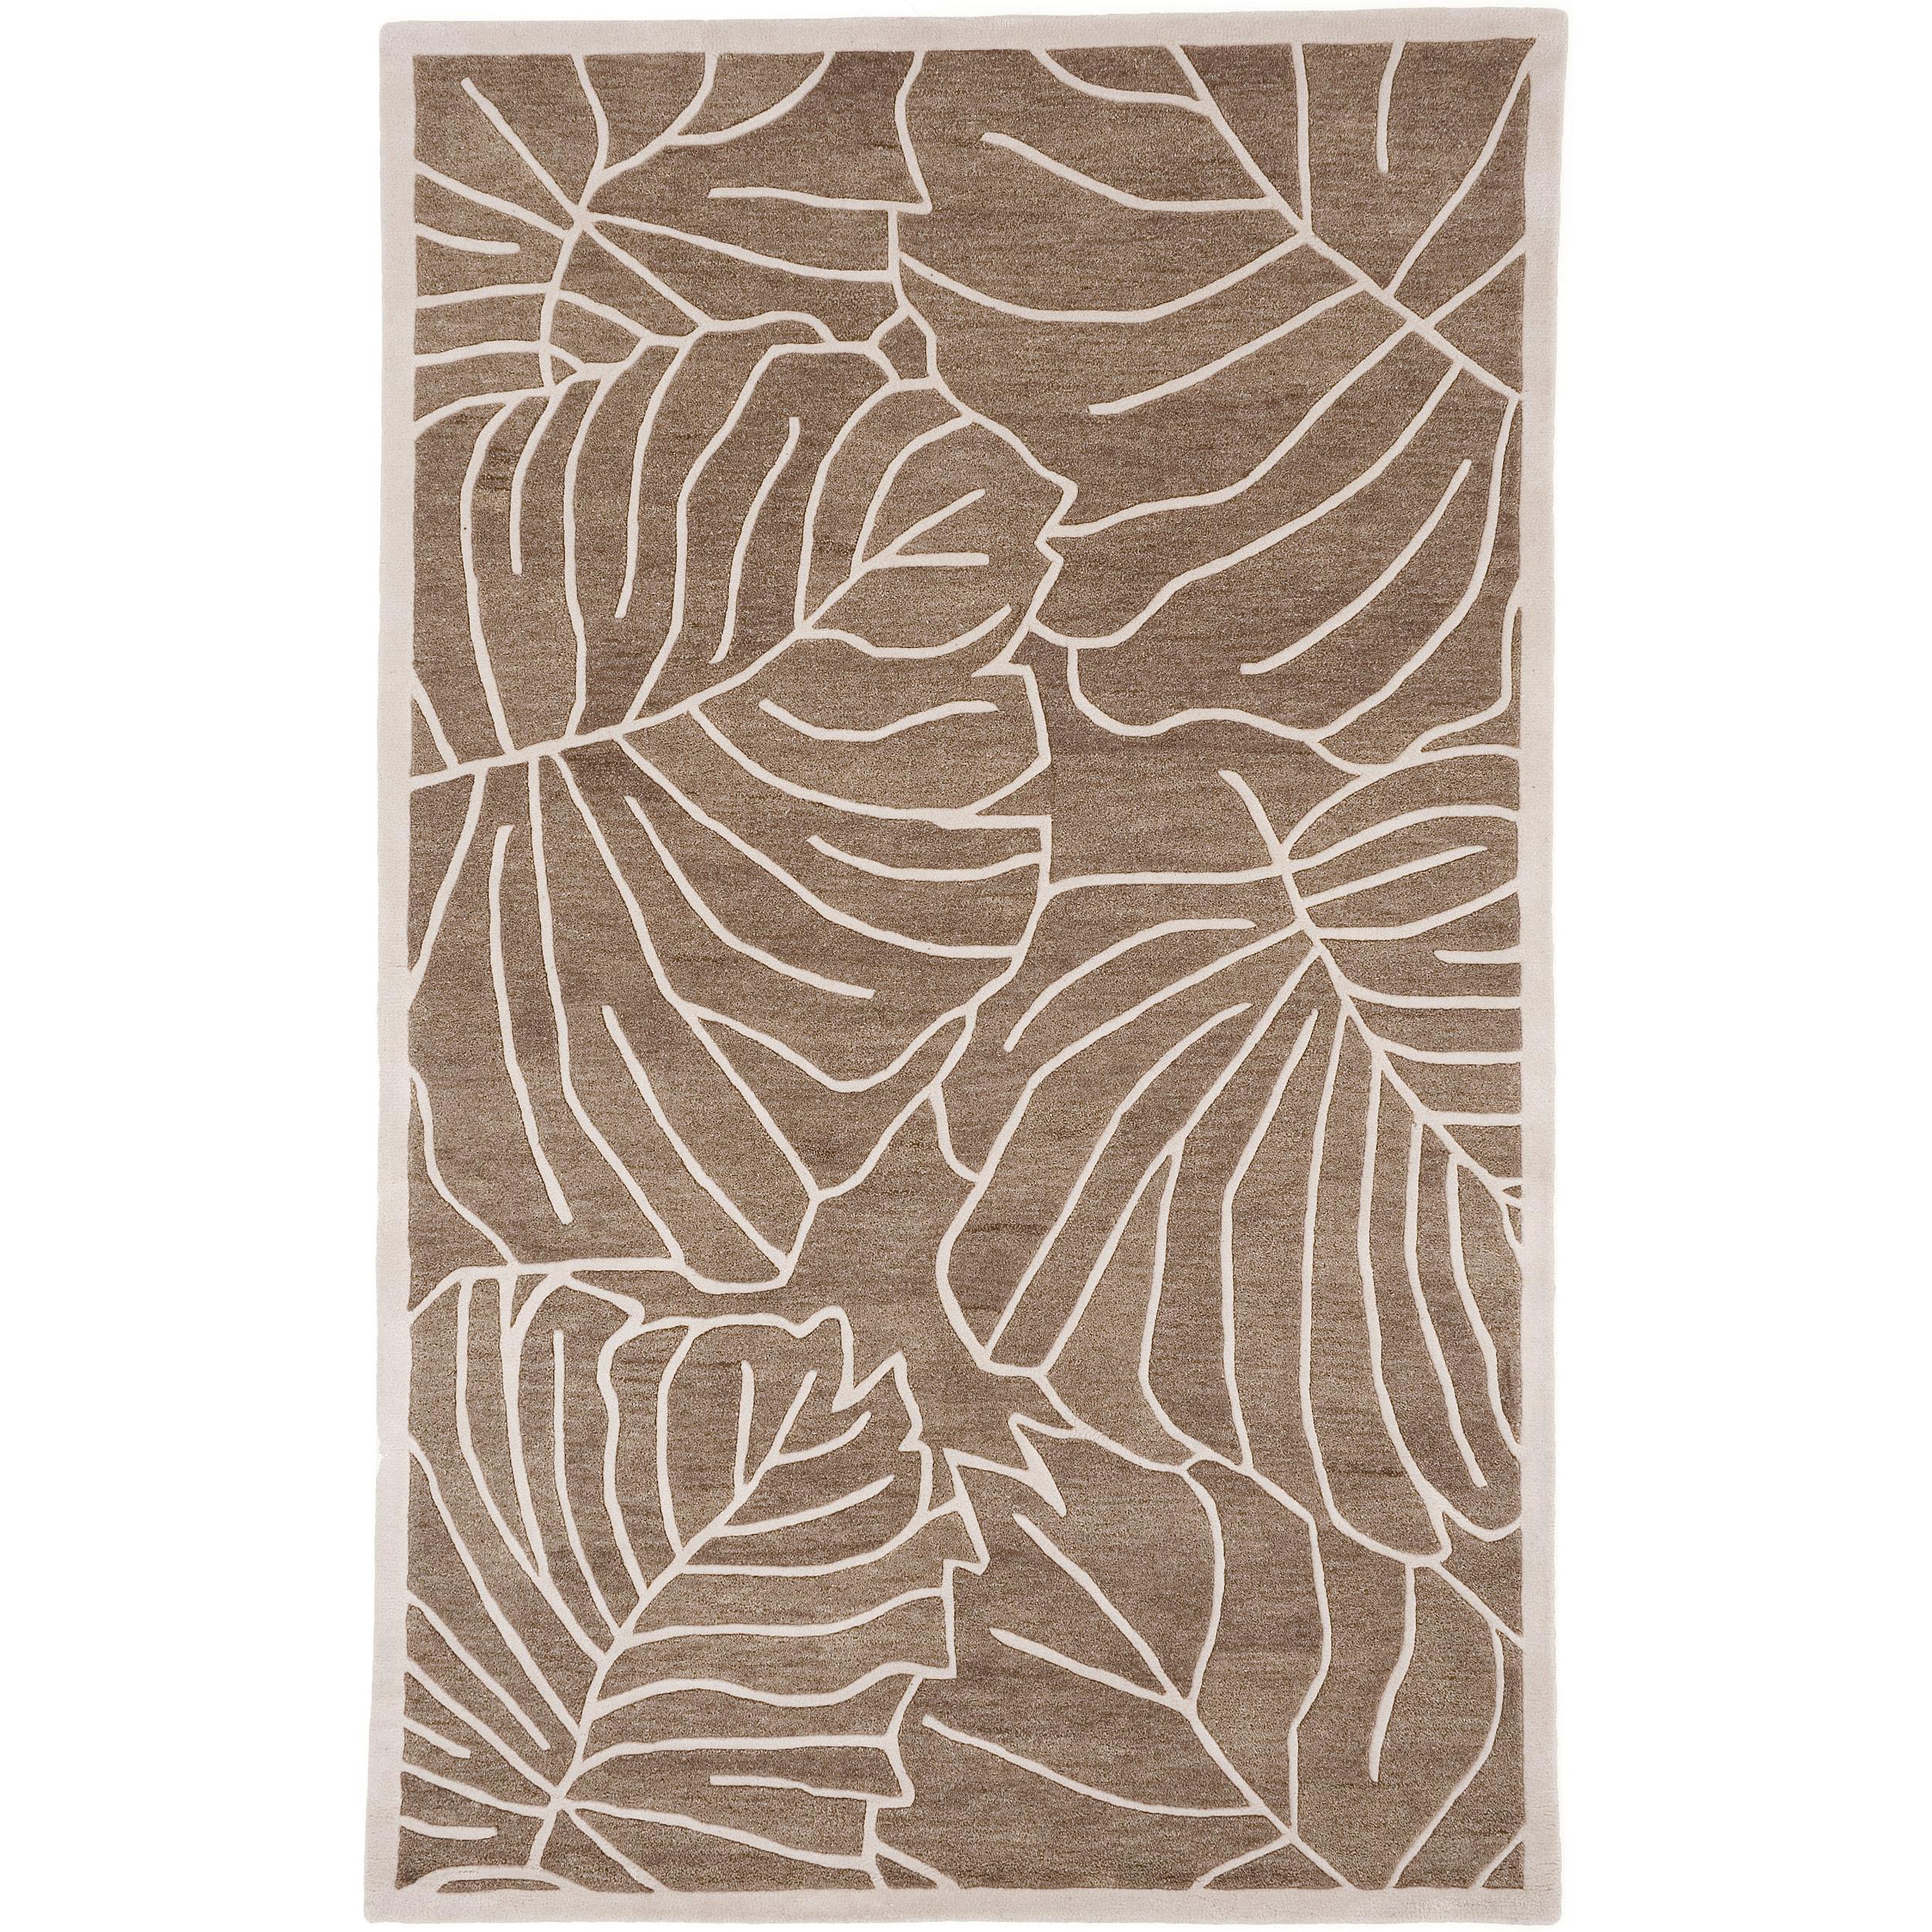 Hand-tufted Tan Kagera New Zealand Wool Rug (3'3 x 5'3)